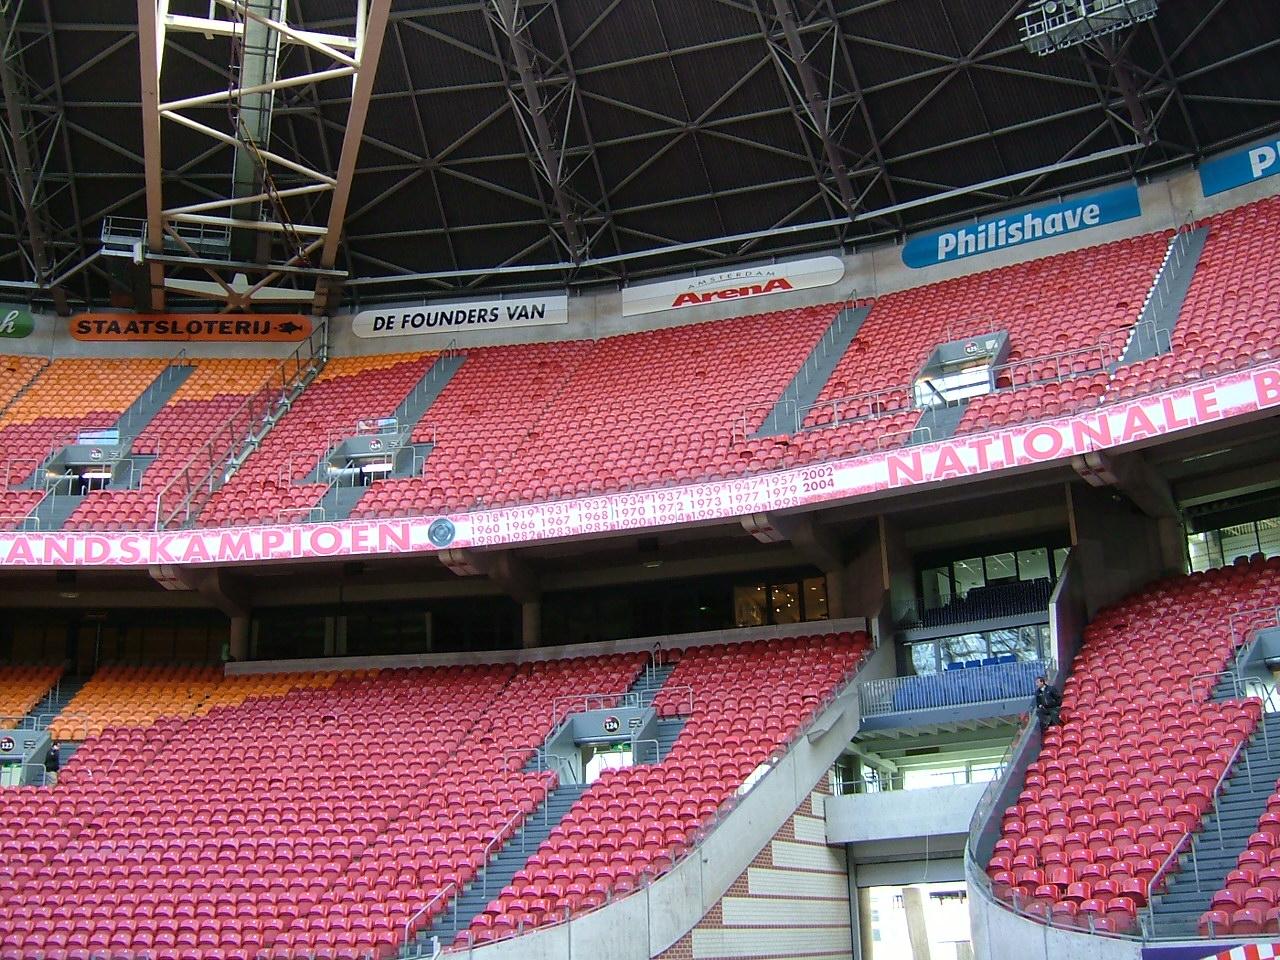 amsterdam arena (46)